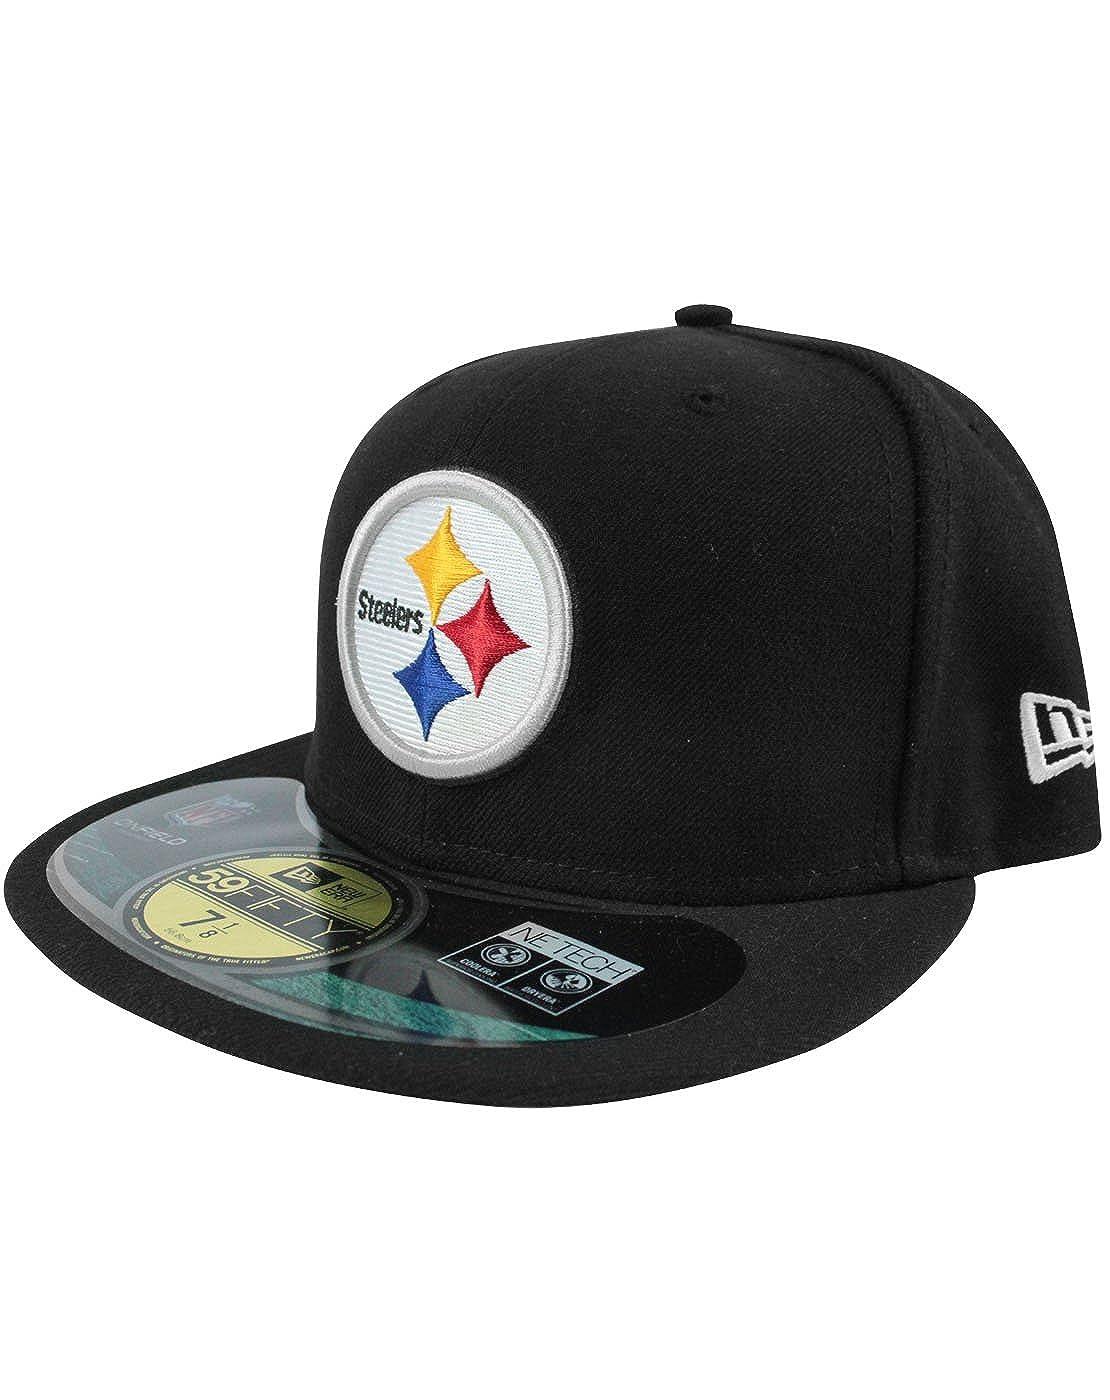 595666c1a6bf2 Unisex-Adultos - New Era - Pittsburgh Steelers - Gorra  Amazon.es  Ropa y  accesorios